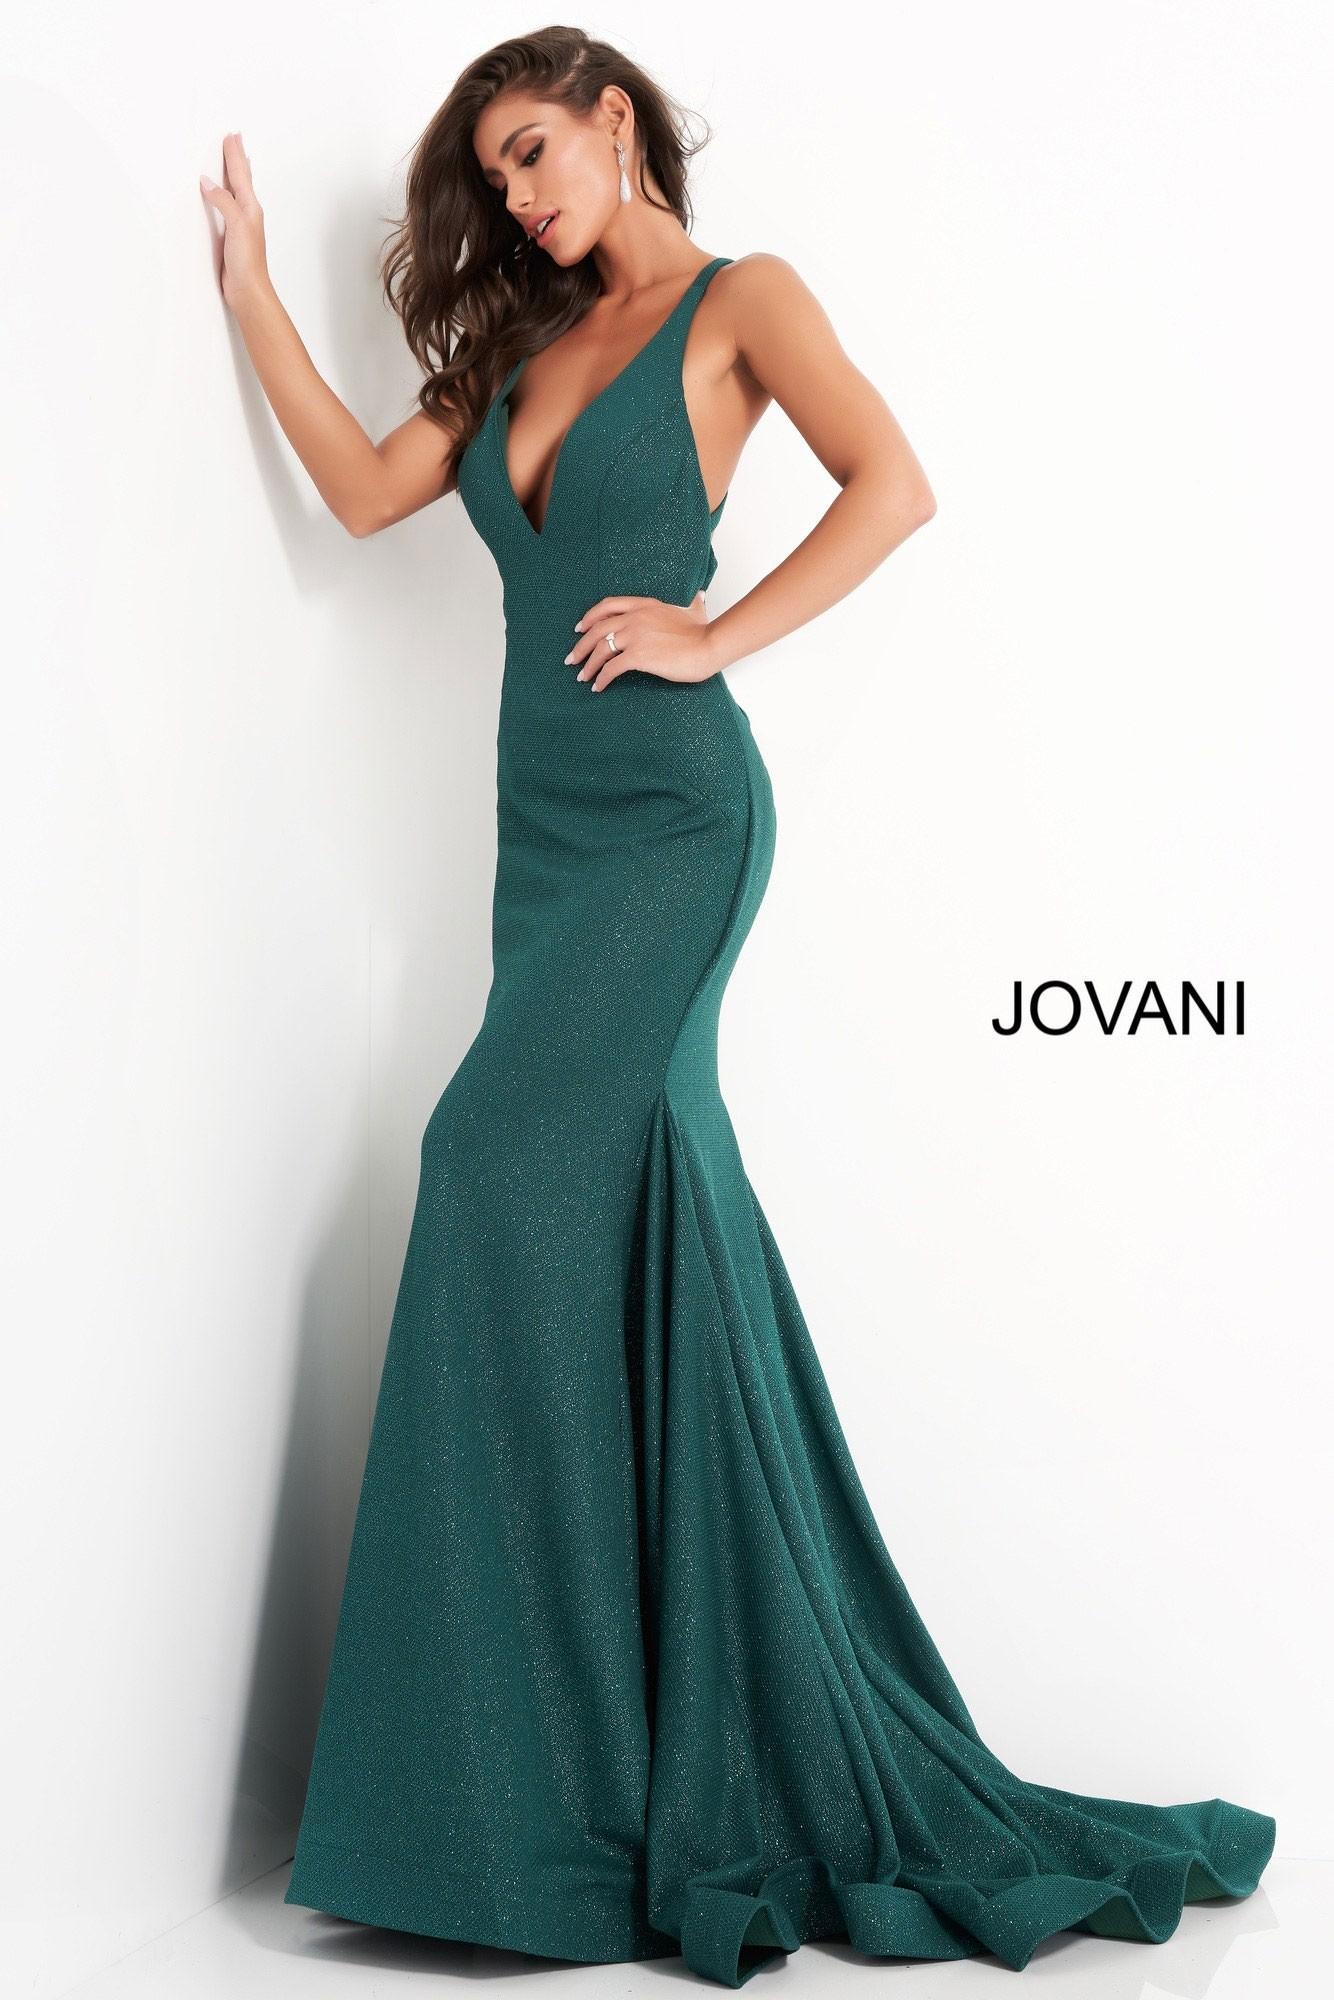 Jovani 00698 Criss Cross Back V-Neck Gown